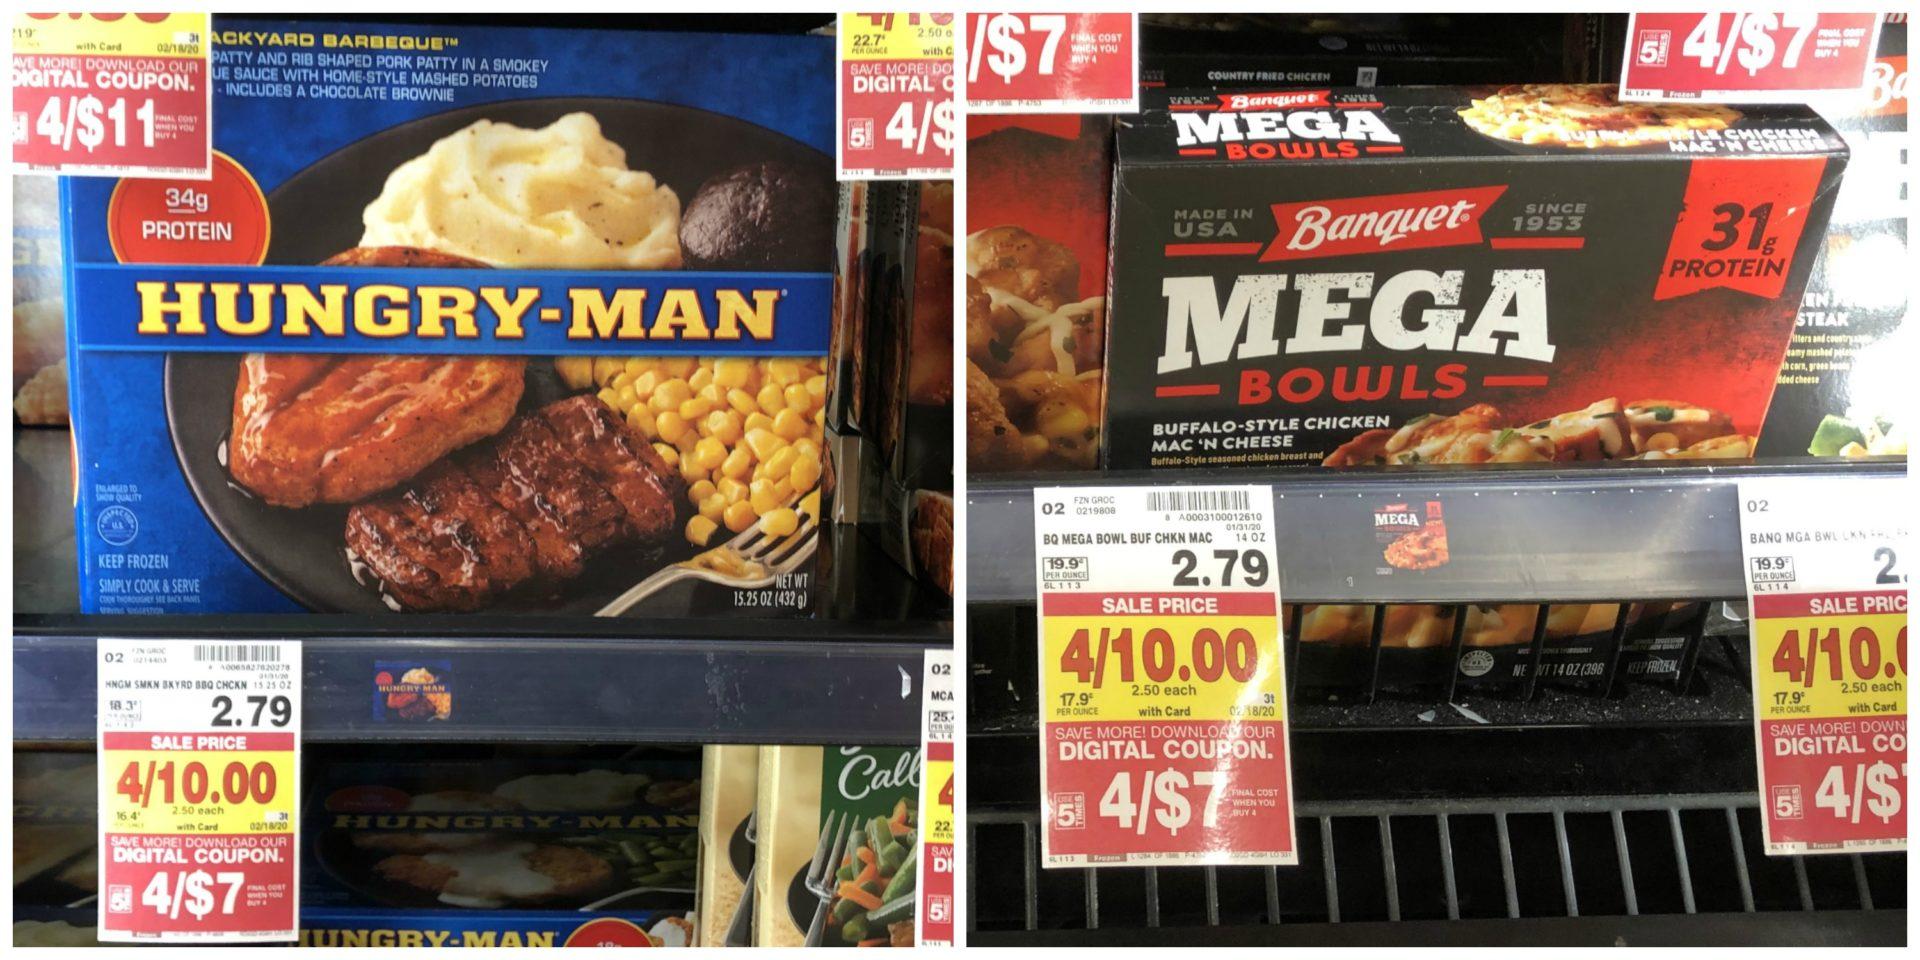 Marie Callender's, Hungry-Man, & Banquet Mega Bowls Only $1.75 At Kroger